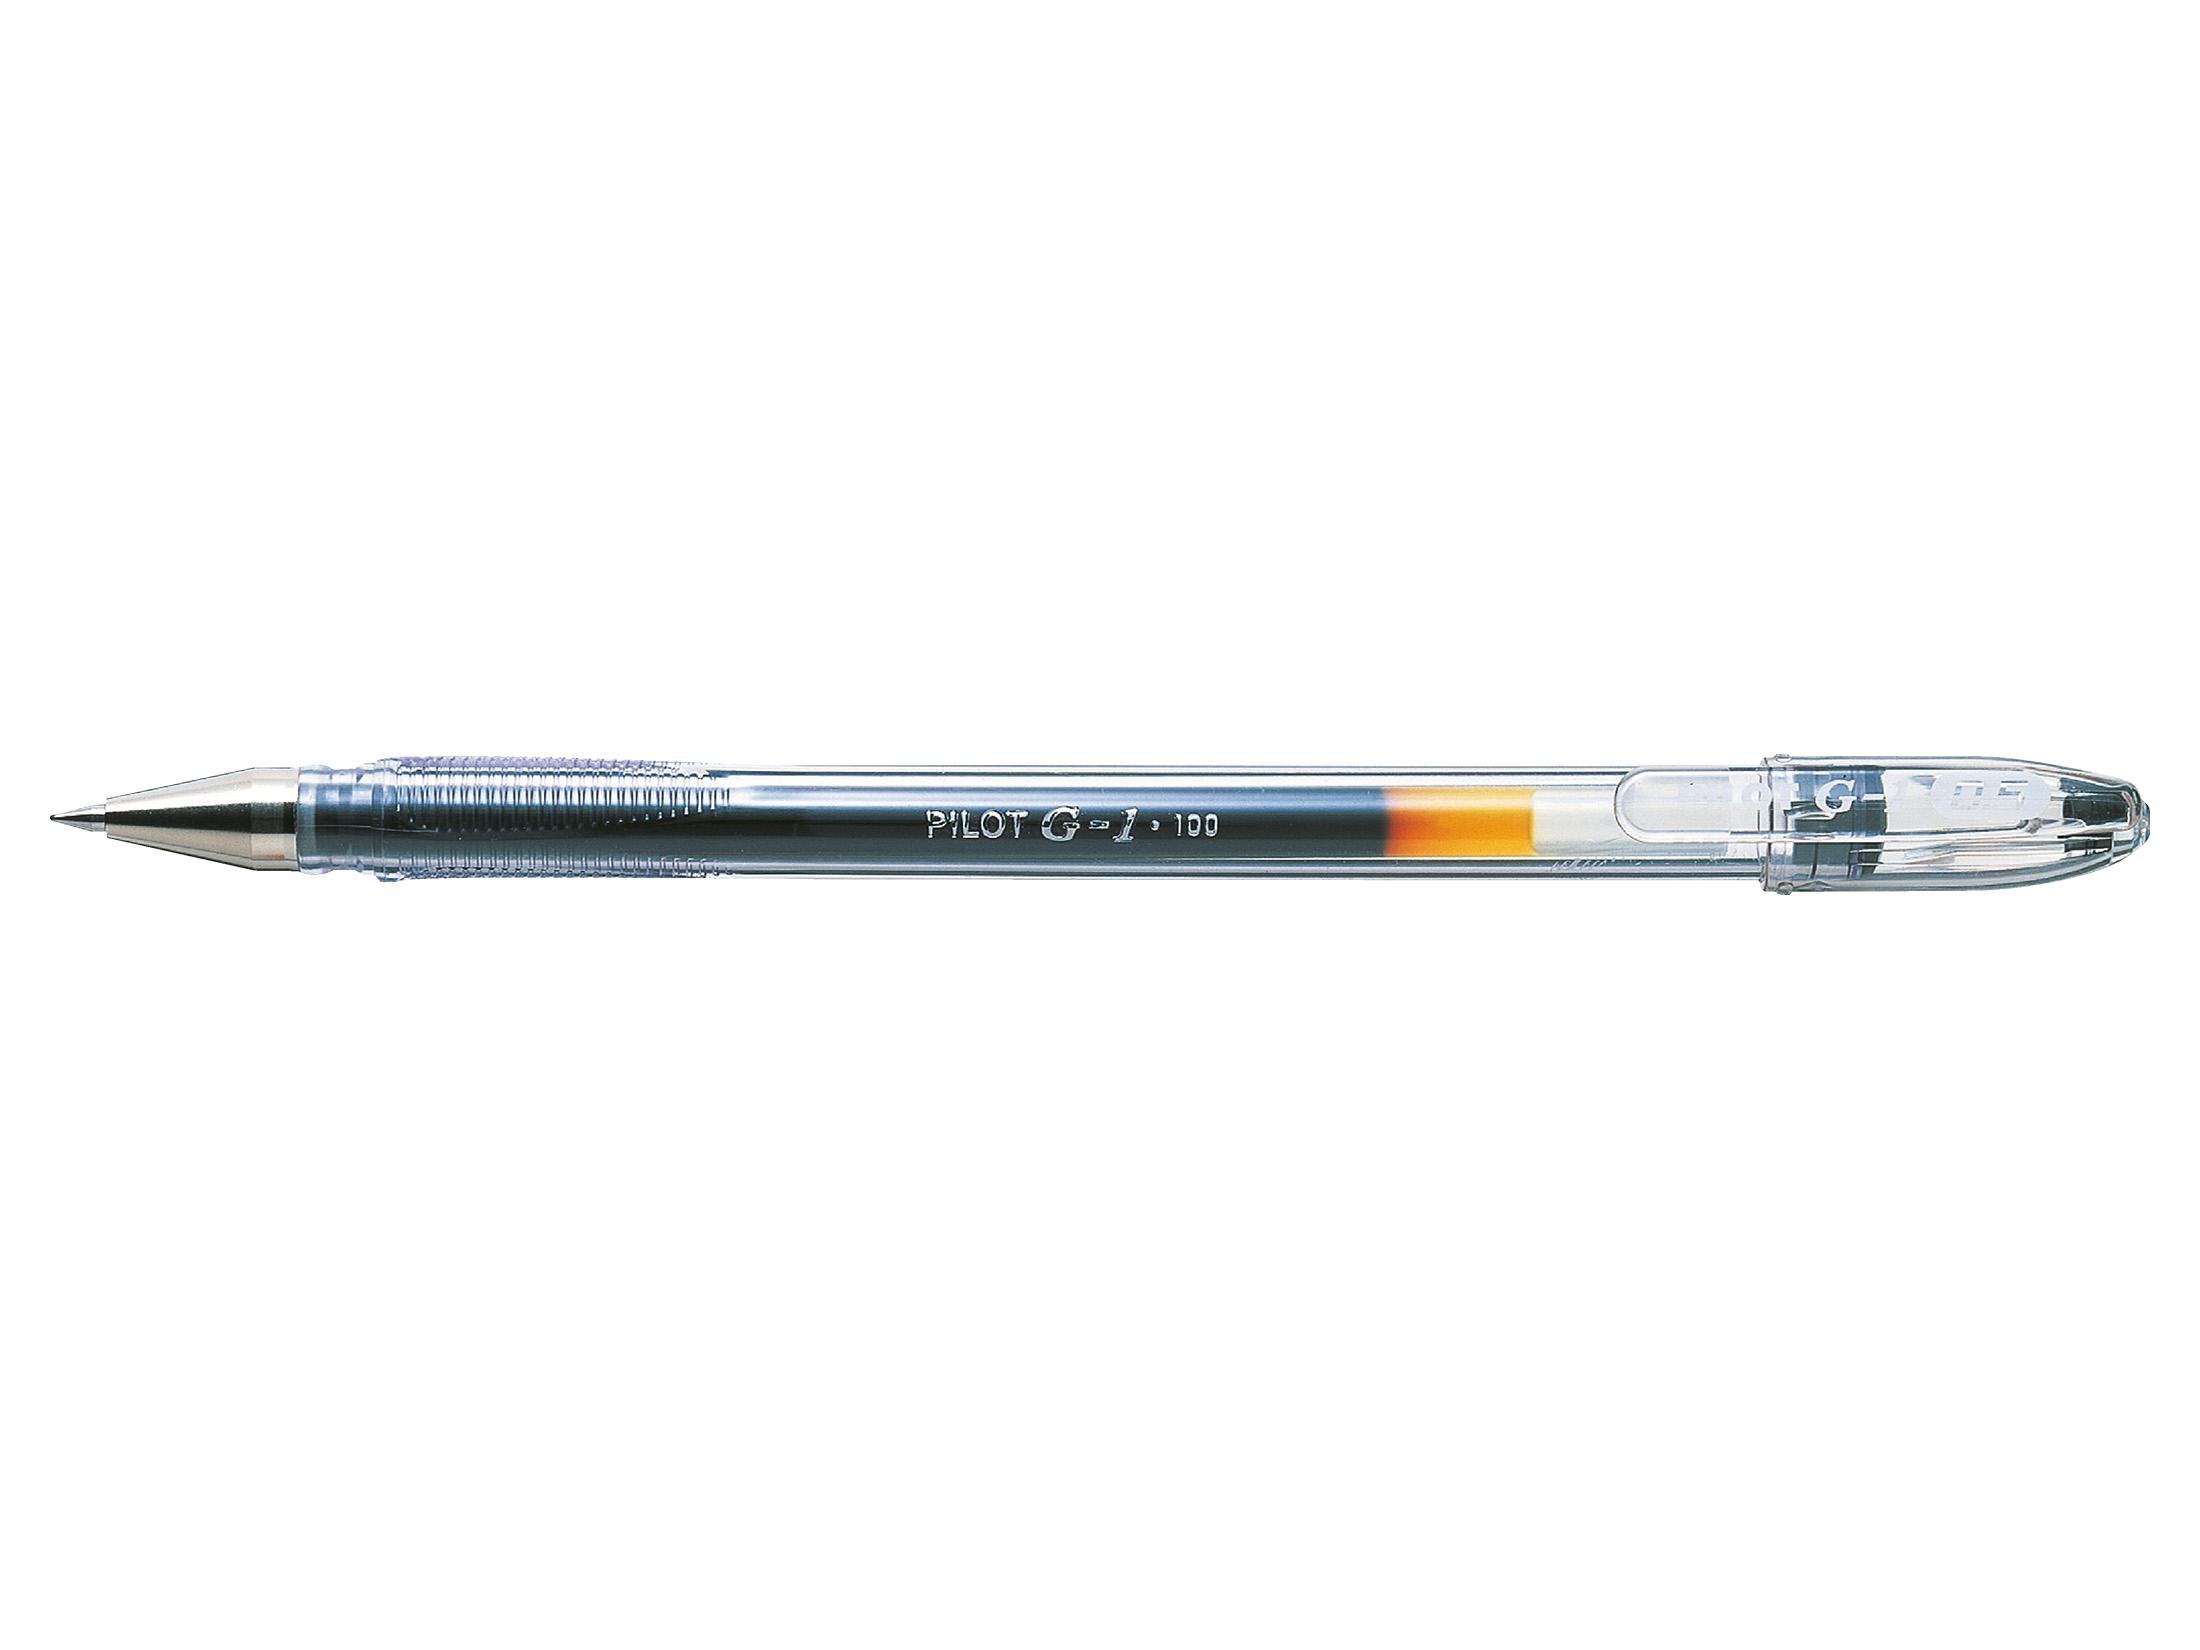 Box of 12 Pilot G-1 0.7 Gel Ink Rollerball  pens Black